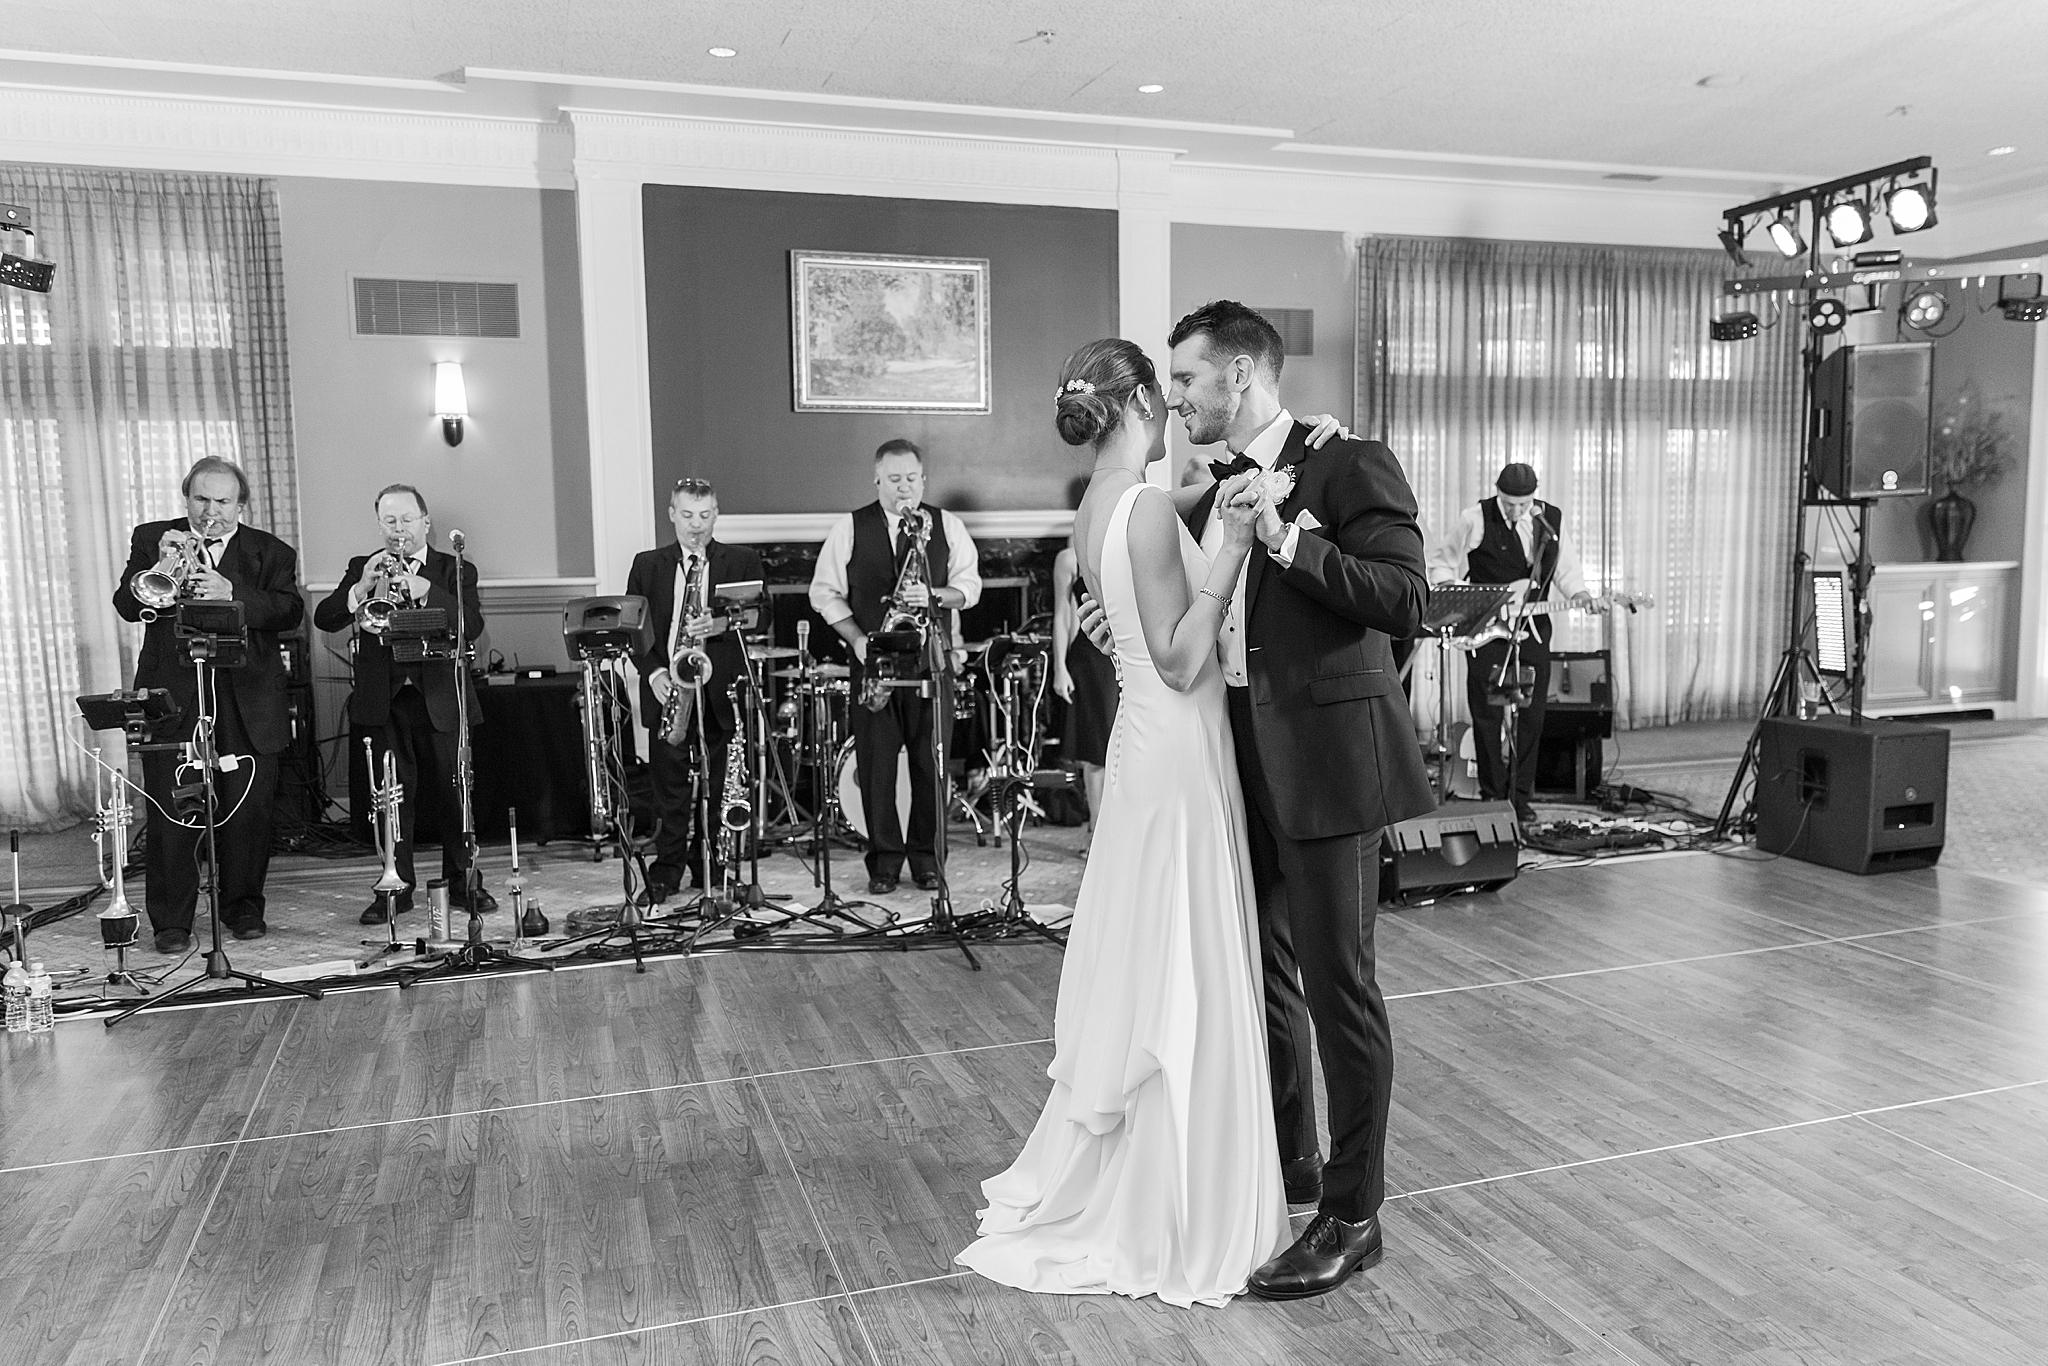 detroit-wedding-photographer-grosse-pointe-academy-chapel-detroit-golf-club-wedding-carly-matt-by-courtney-carolyn-photography_0093.jpg